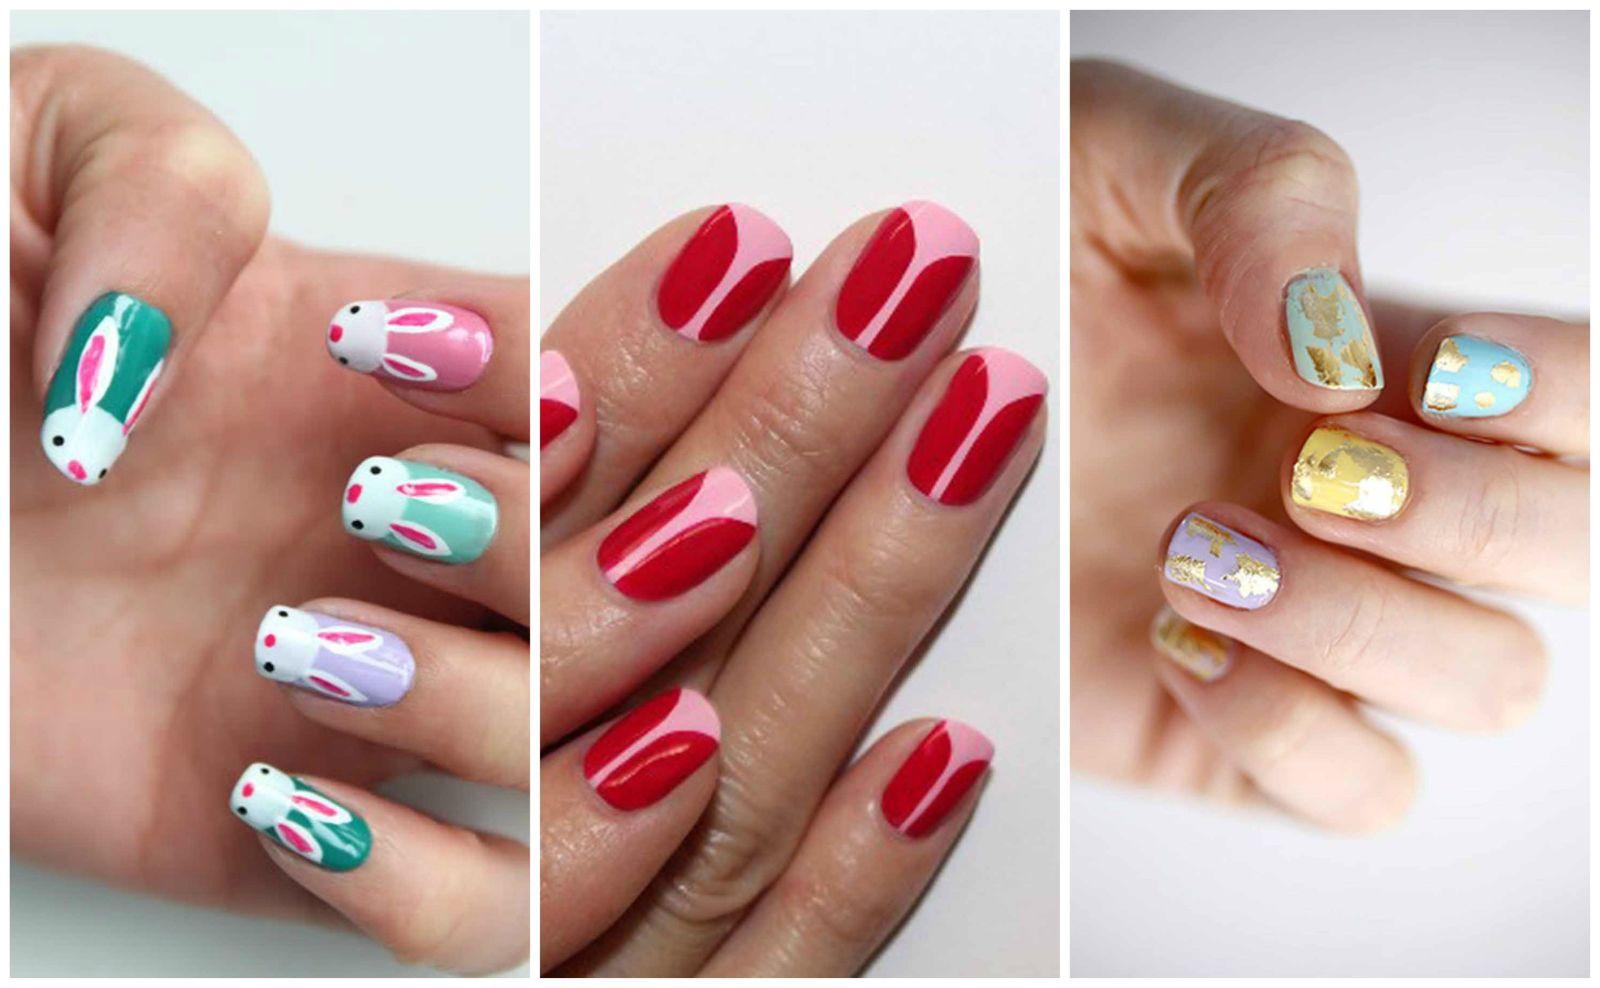 16 Cute Easter Nail Designs - Best Easter Nail Art Ideas